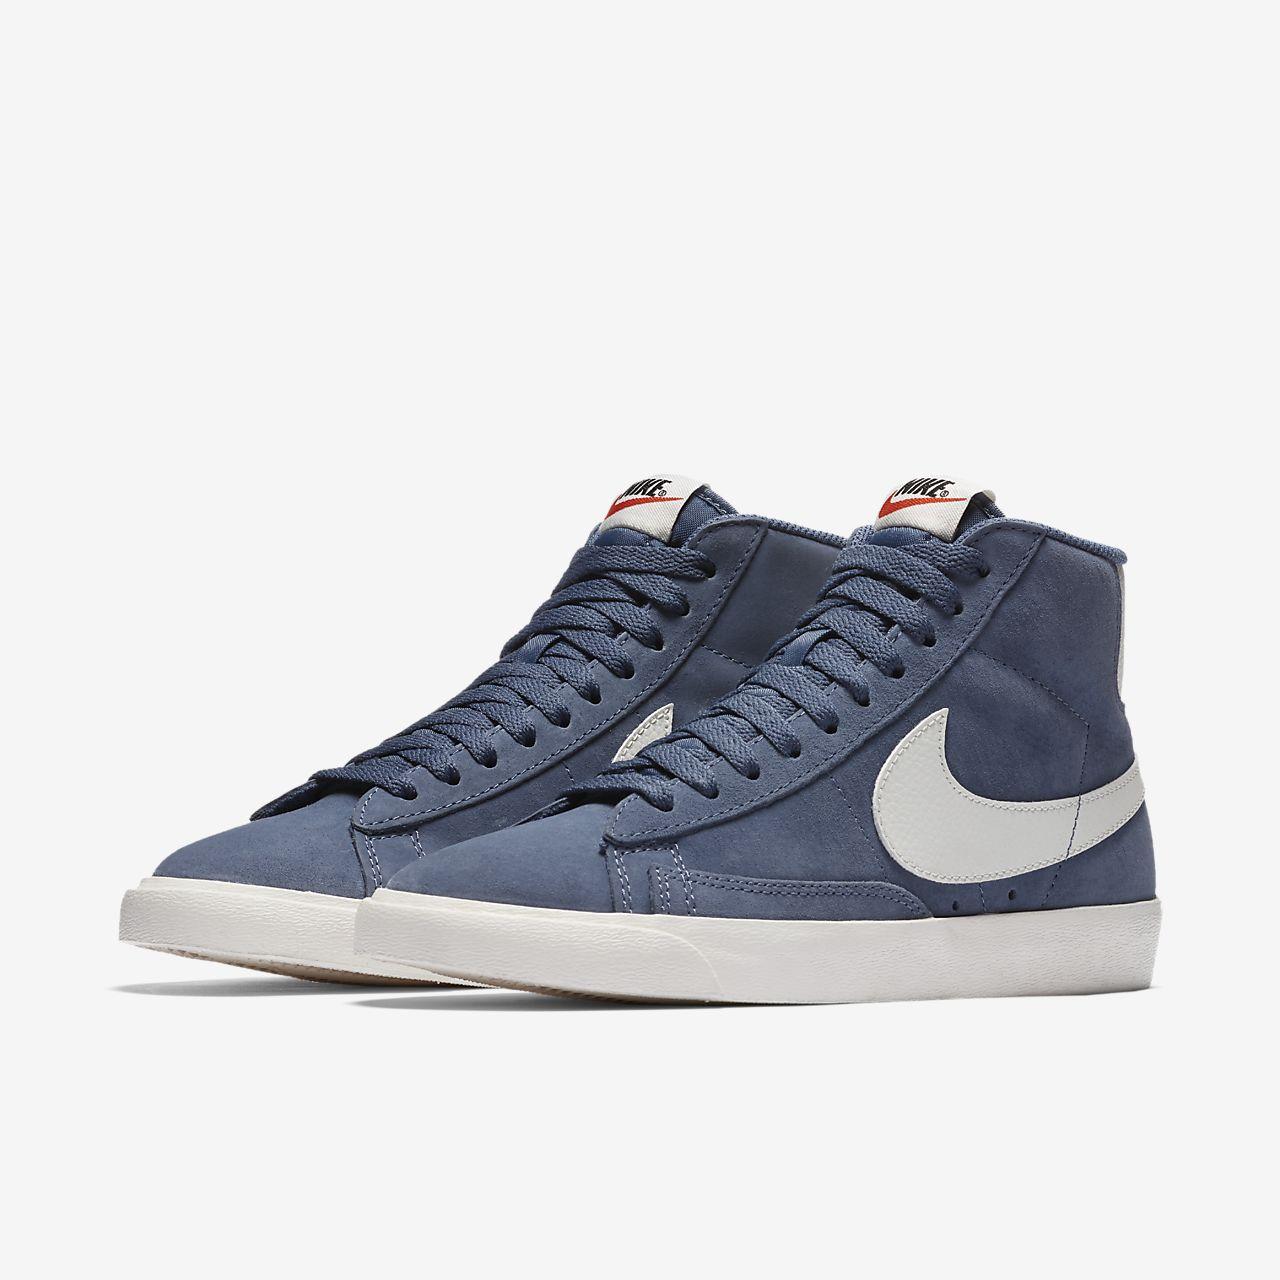 Nike Blazer Mediados De Zapatos Para Mujer